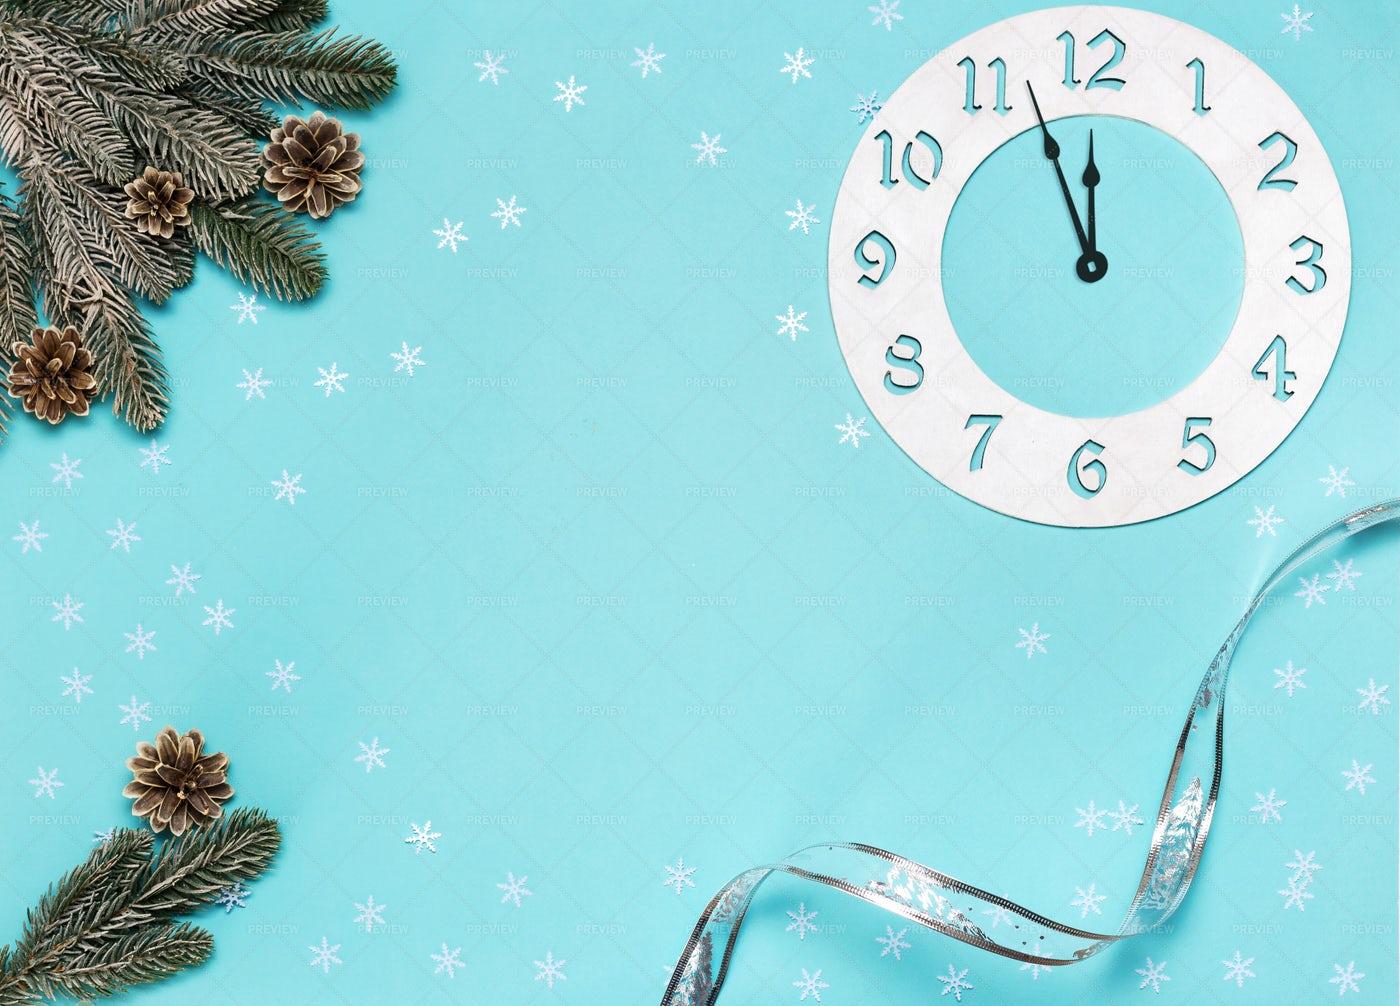 Christmas Decorations On Blue: Stock Photos